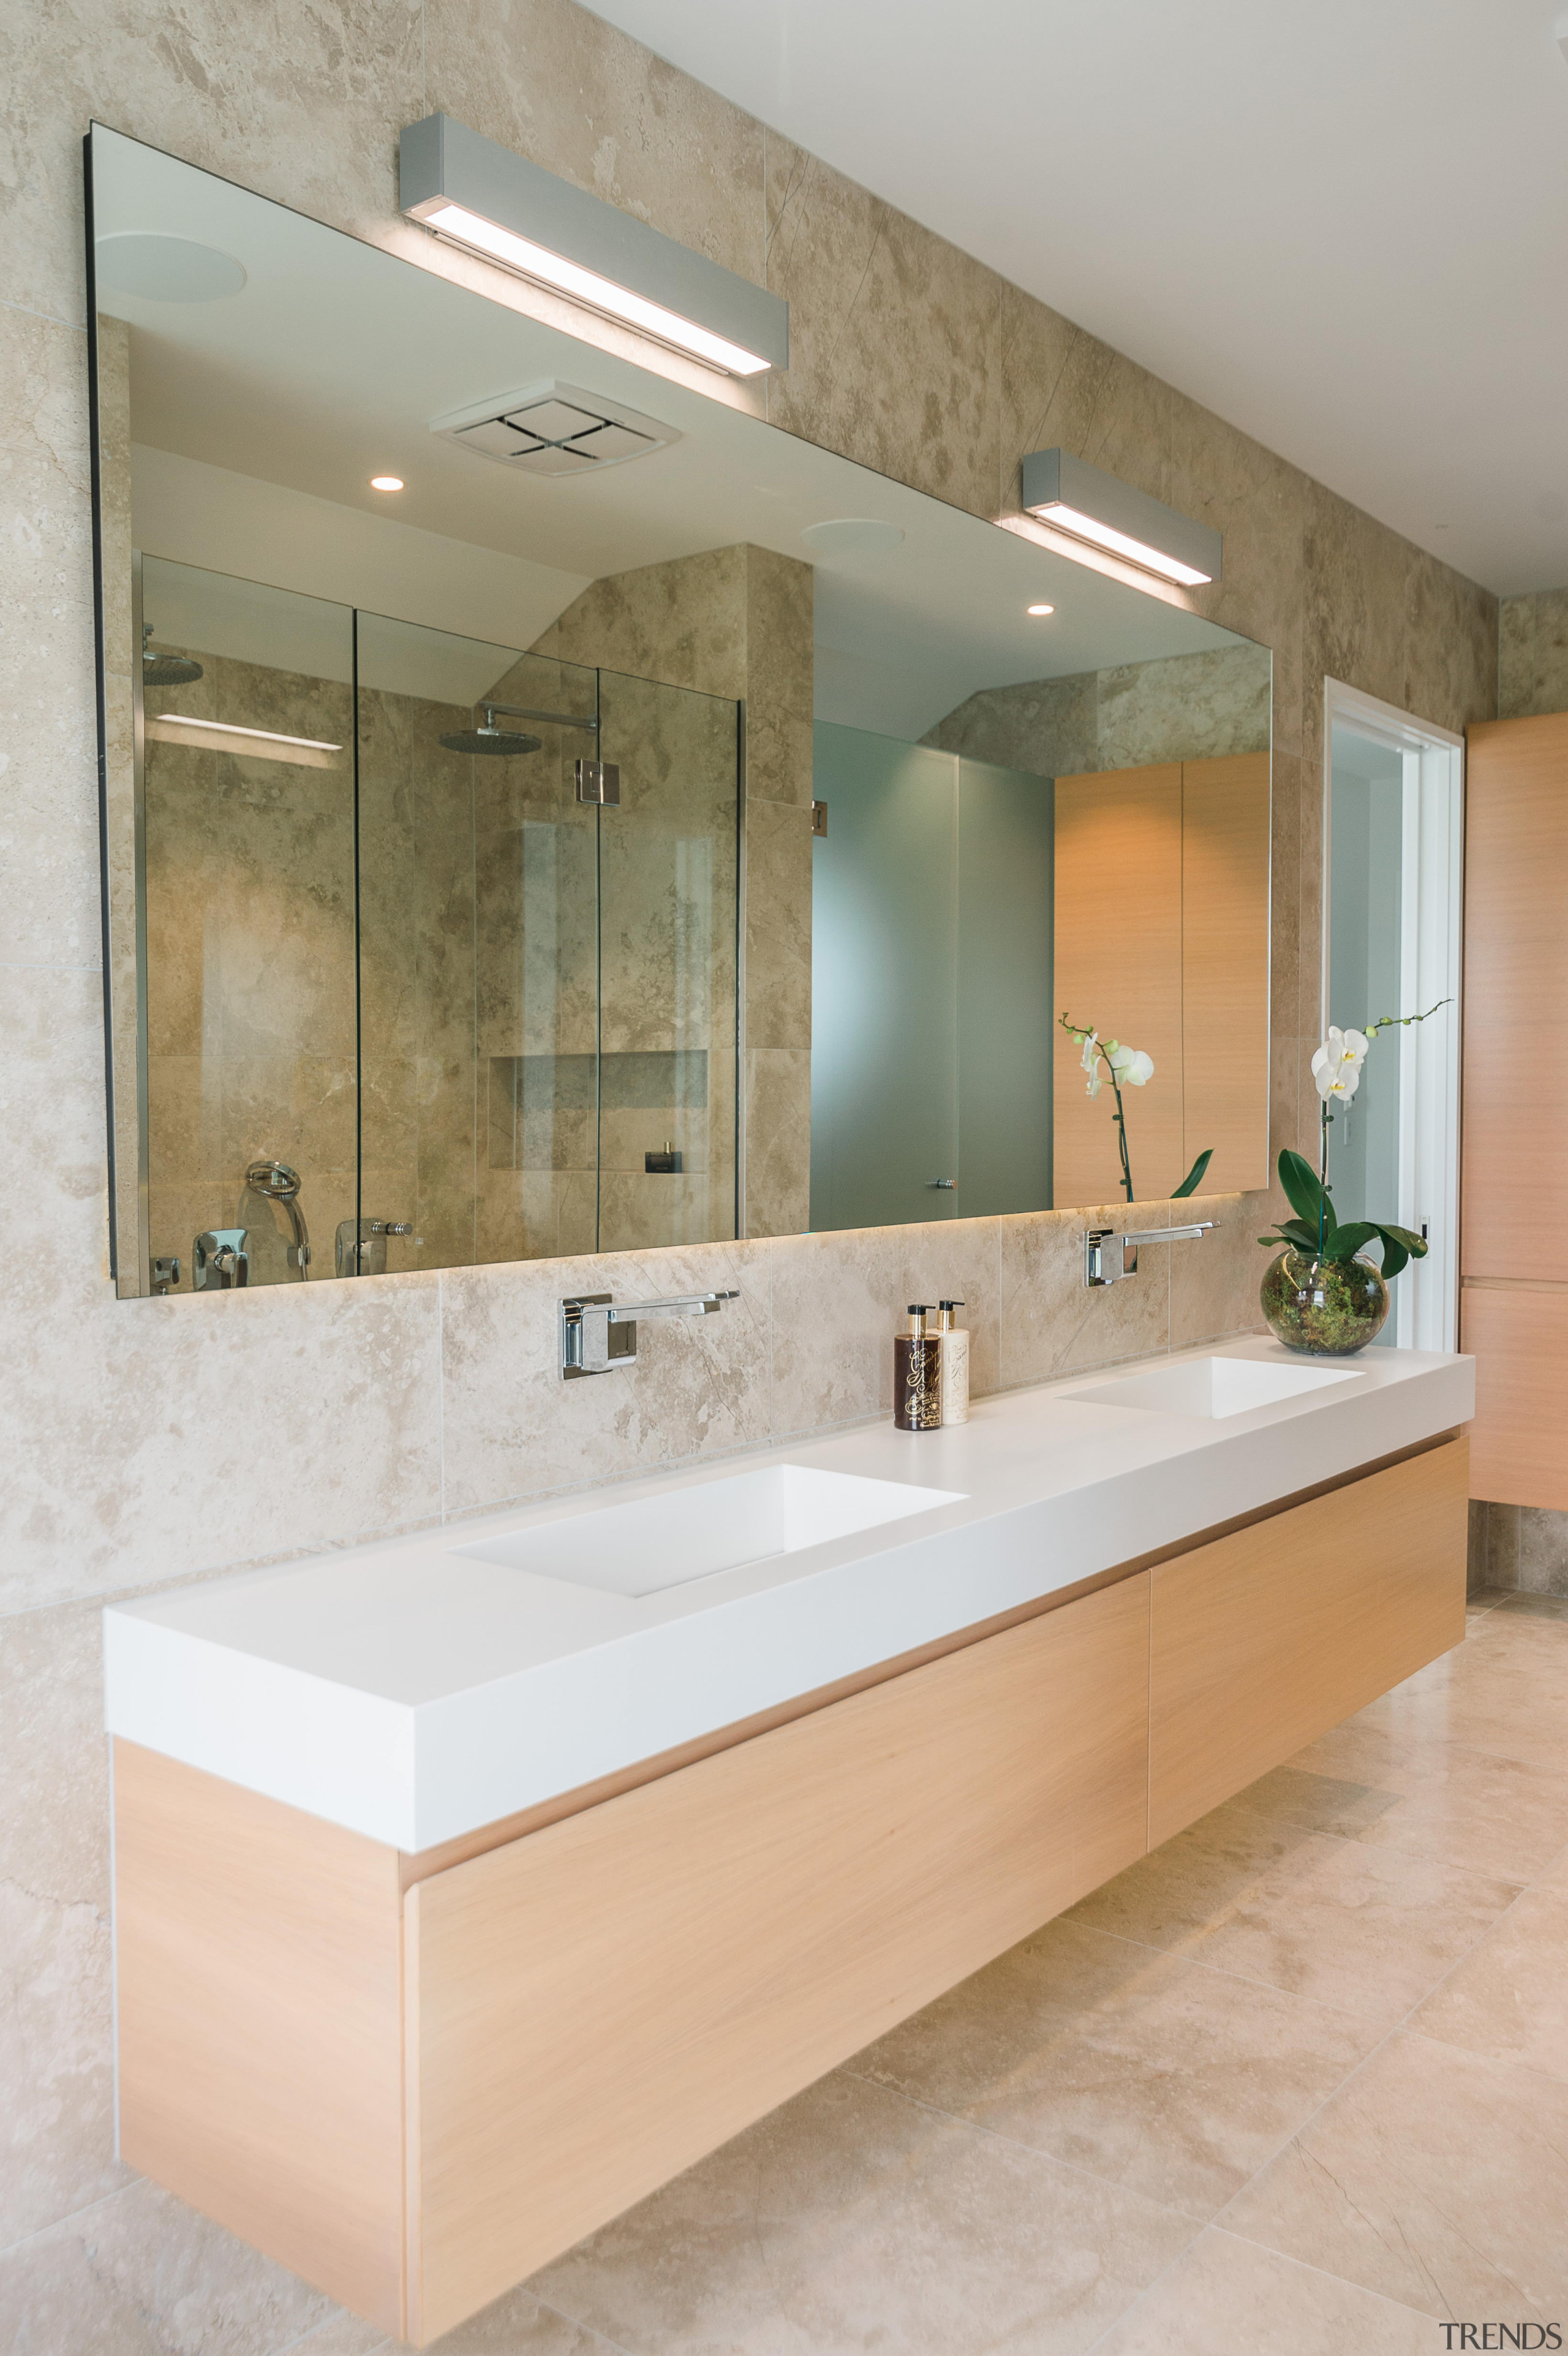 The long mirror in this bathroom has a bathroom, interior design, room, sink, tap, gray